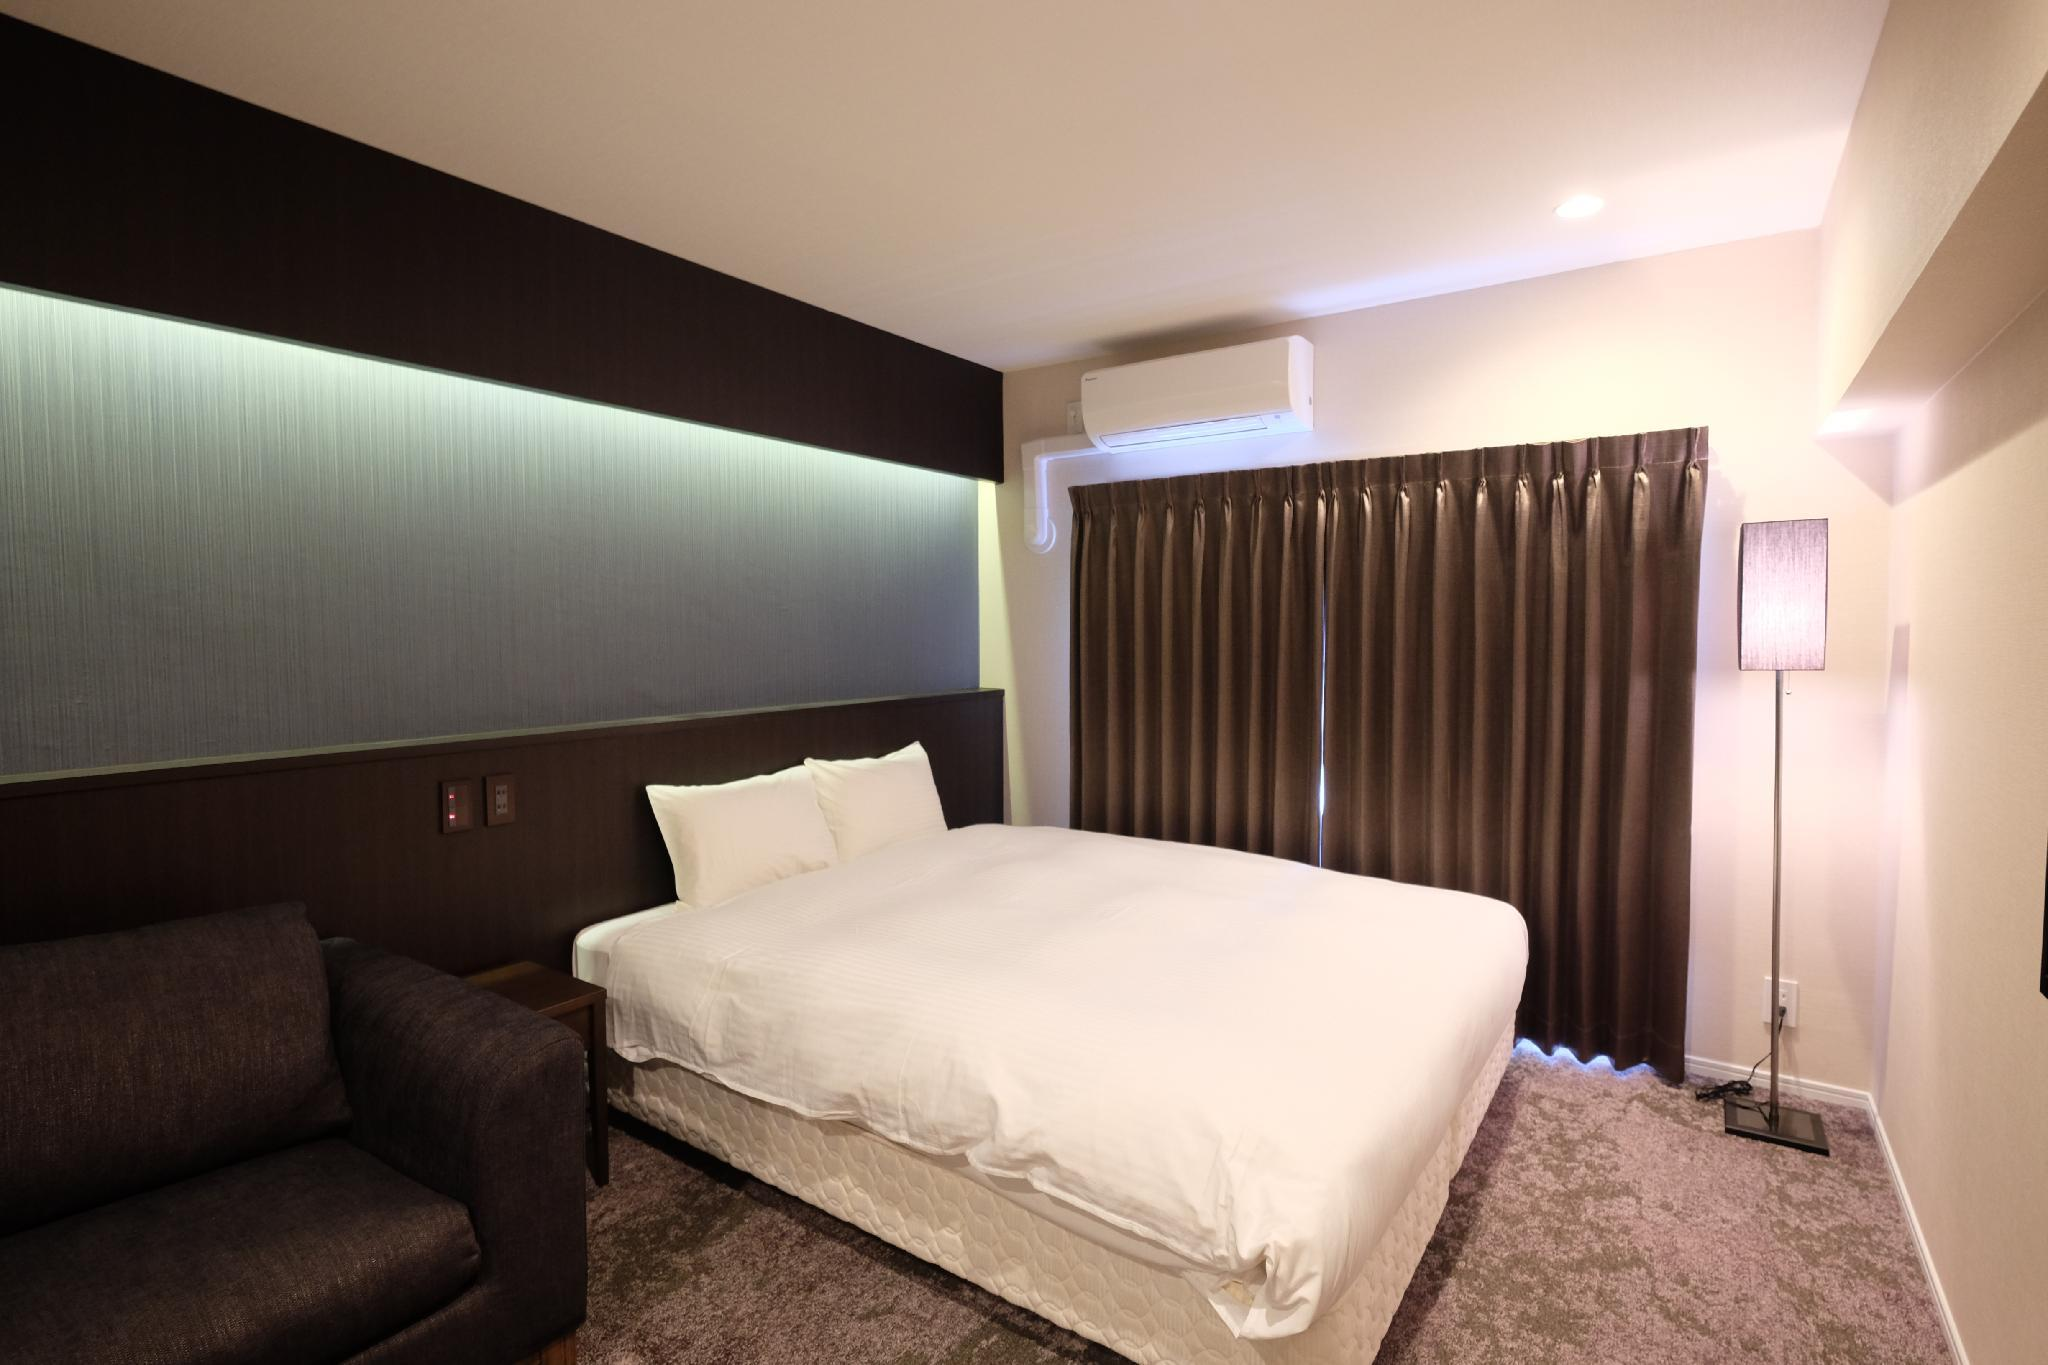 N Nagahori Apartments Hotel Accommodation Agoda In